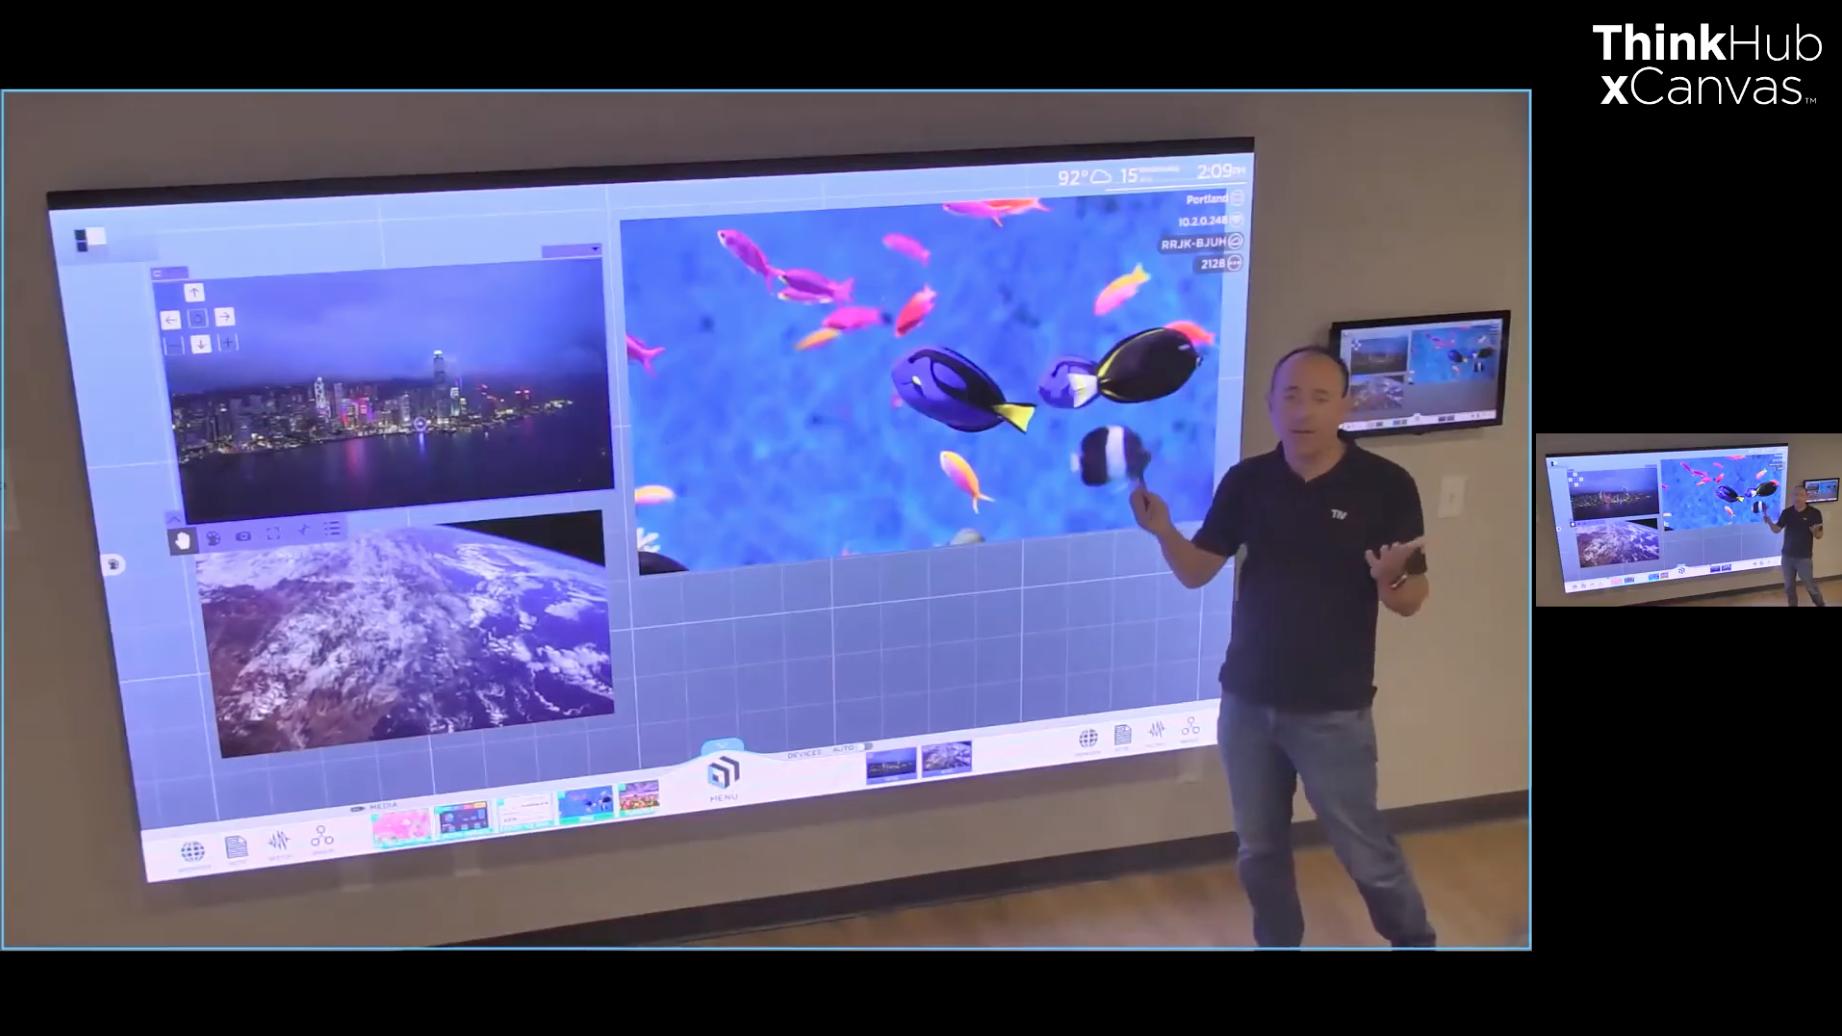 T1V-ThinkHub-xCanvas-collaboration-content-hybrid-teams-software-blog-image